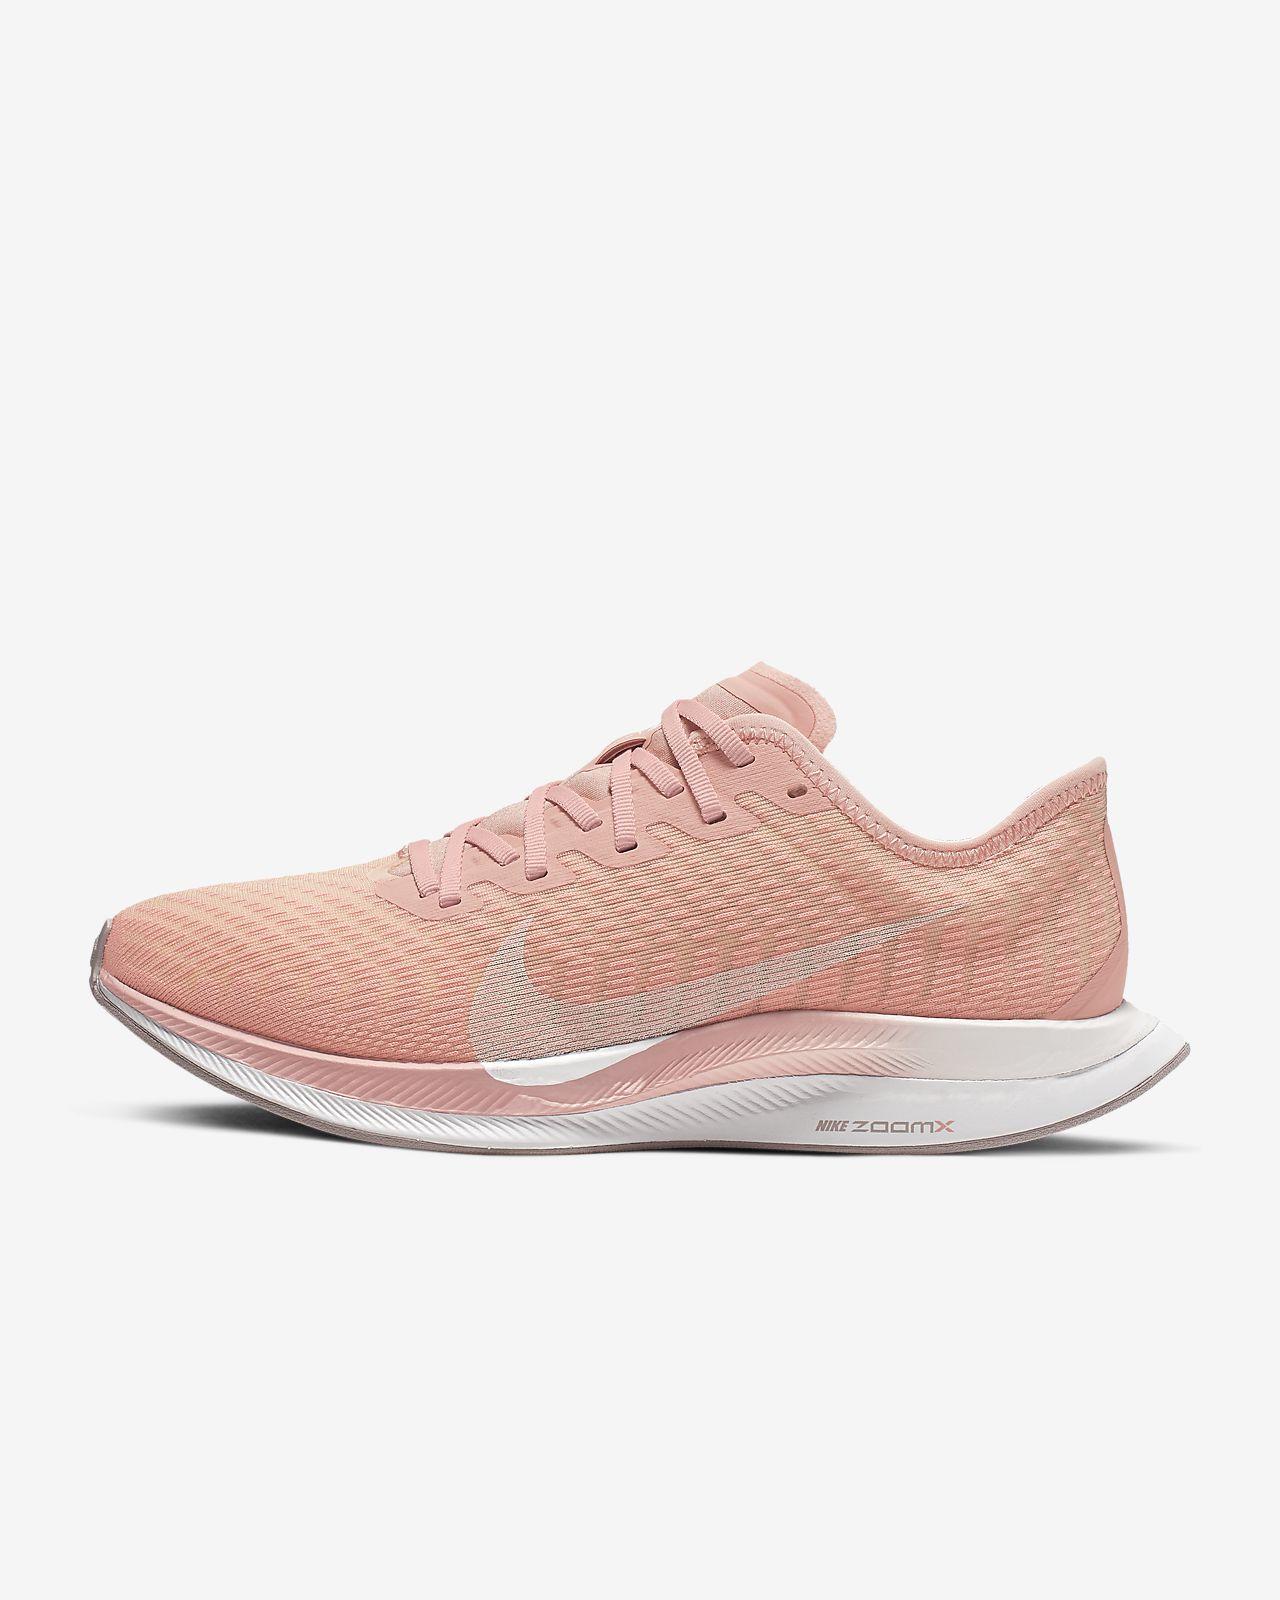 Nike Zoom Pegasus Turbo 2 Damen Laufschuh